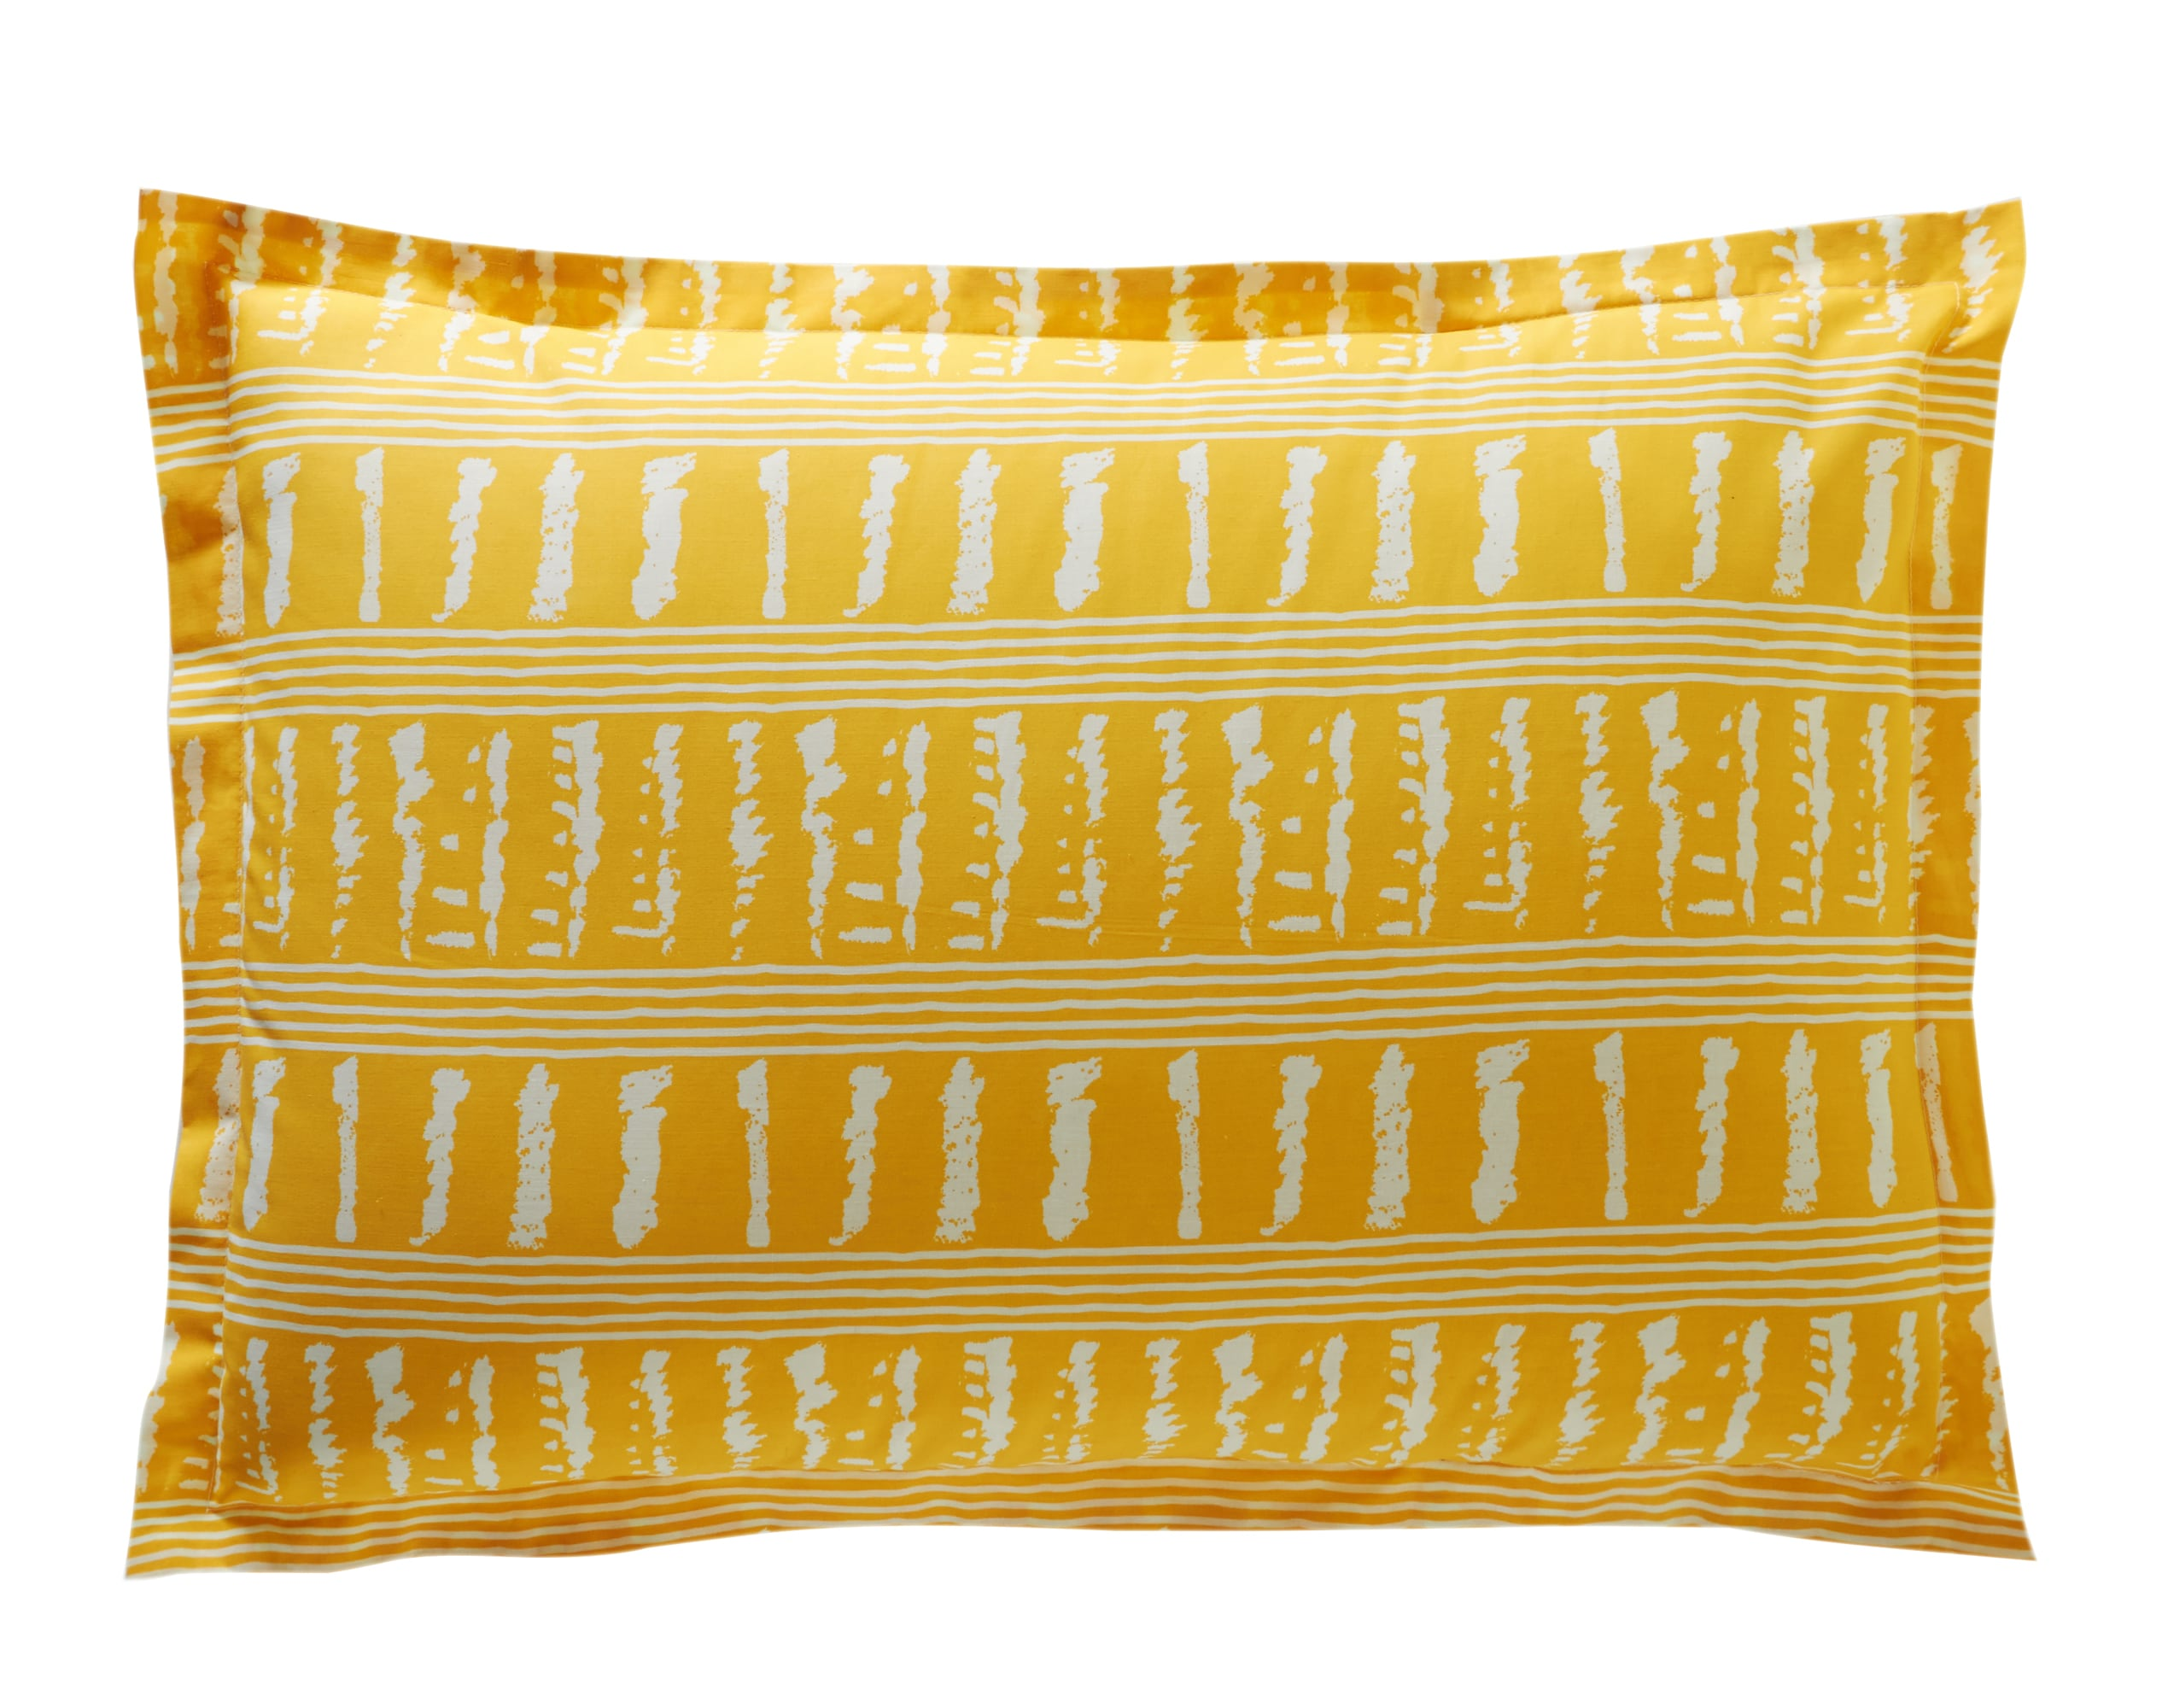 Taie d'oreiller rectangulaire en coton jaune